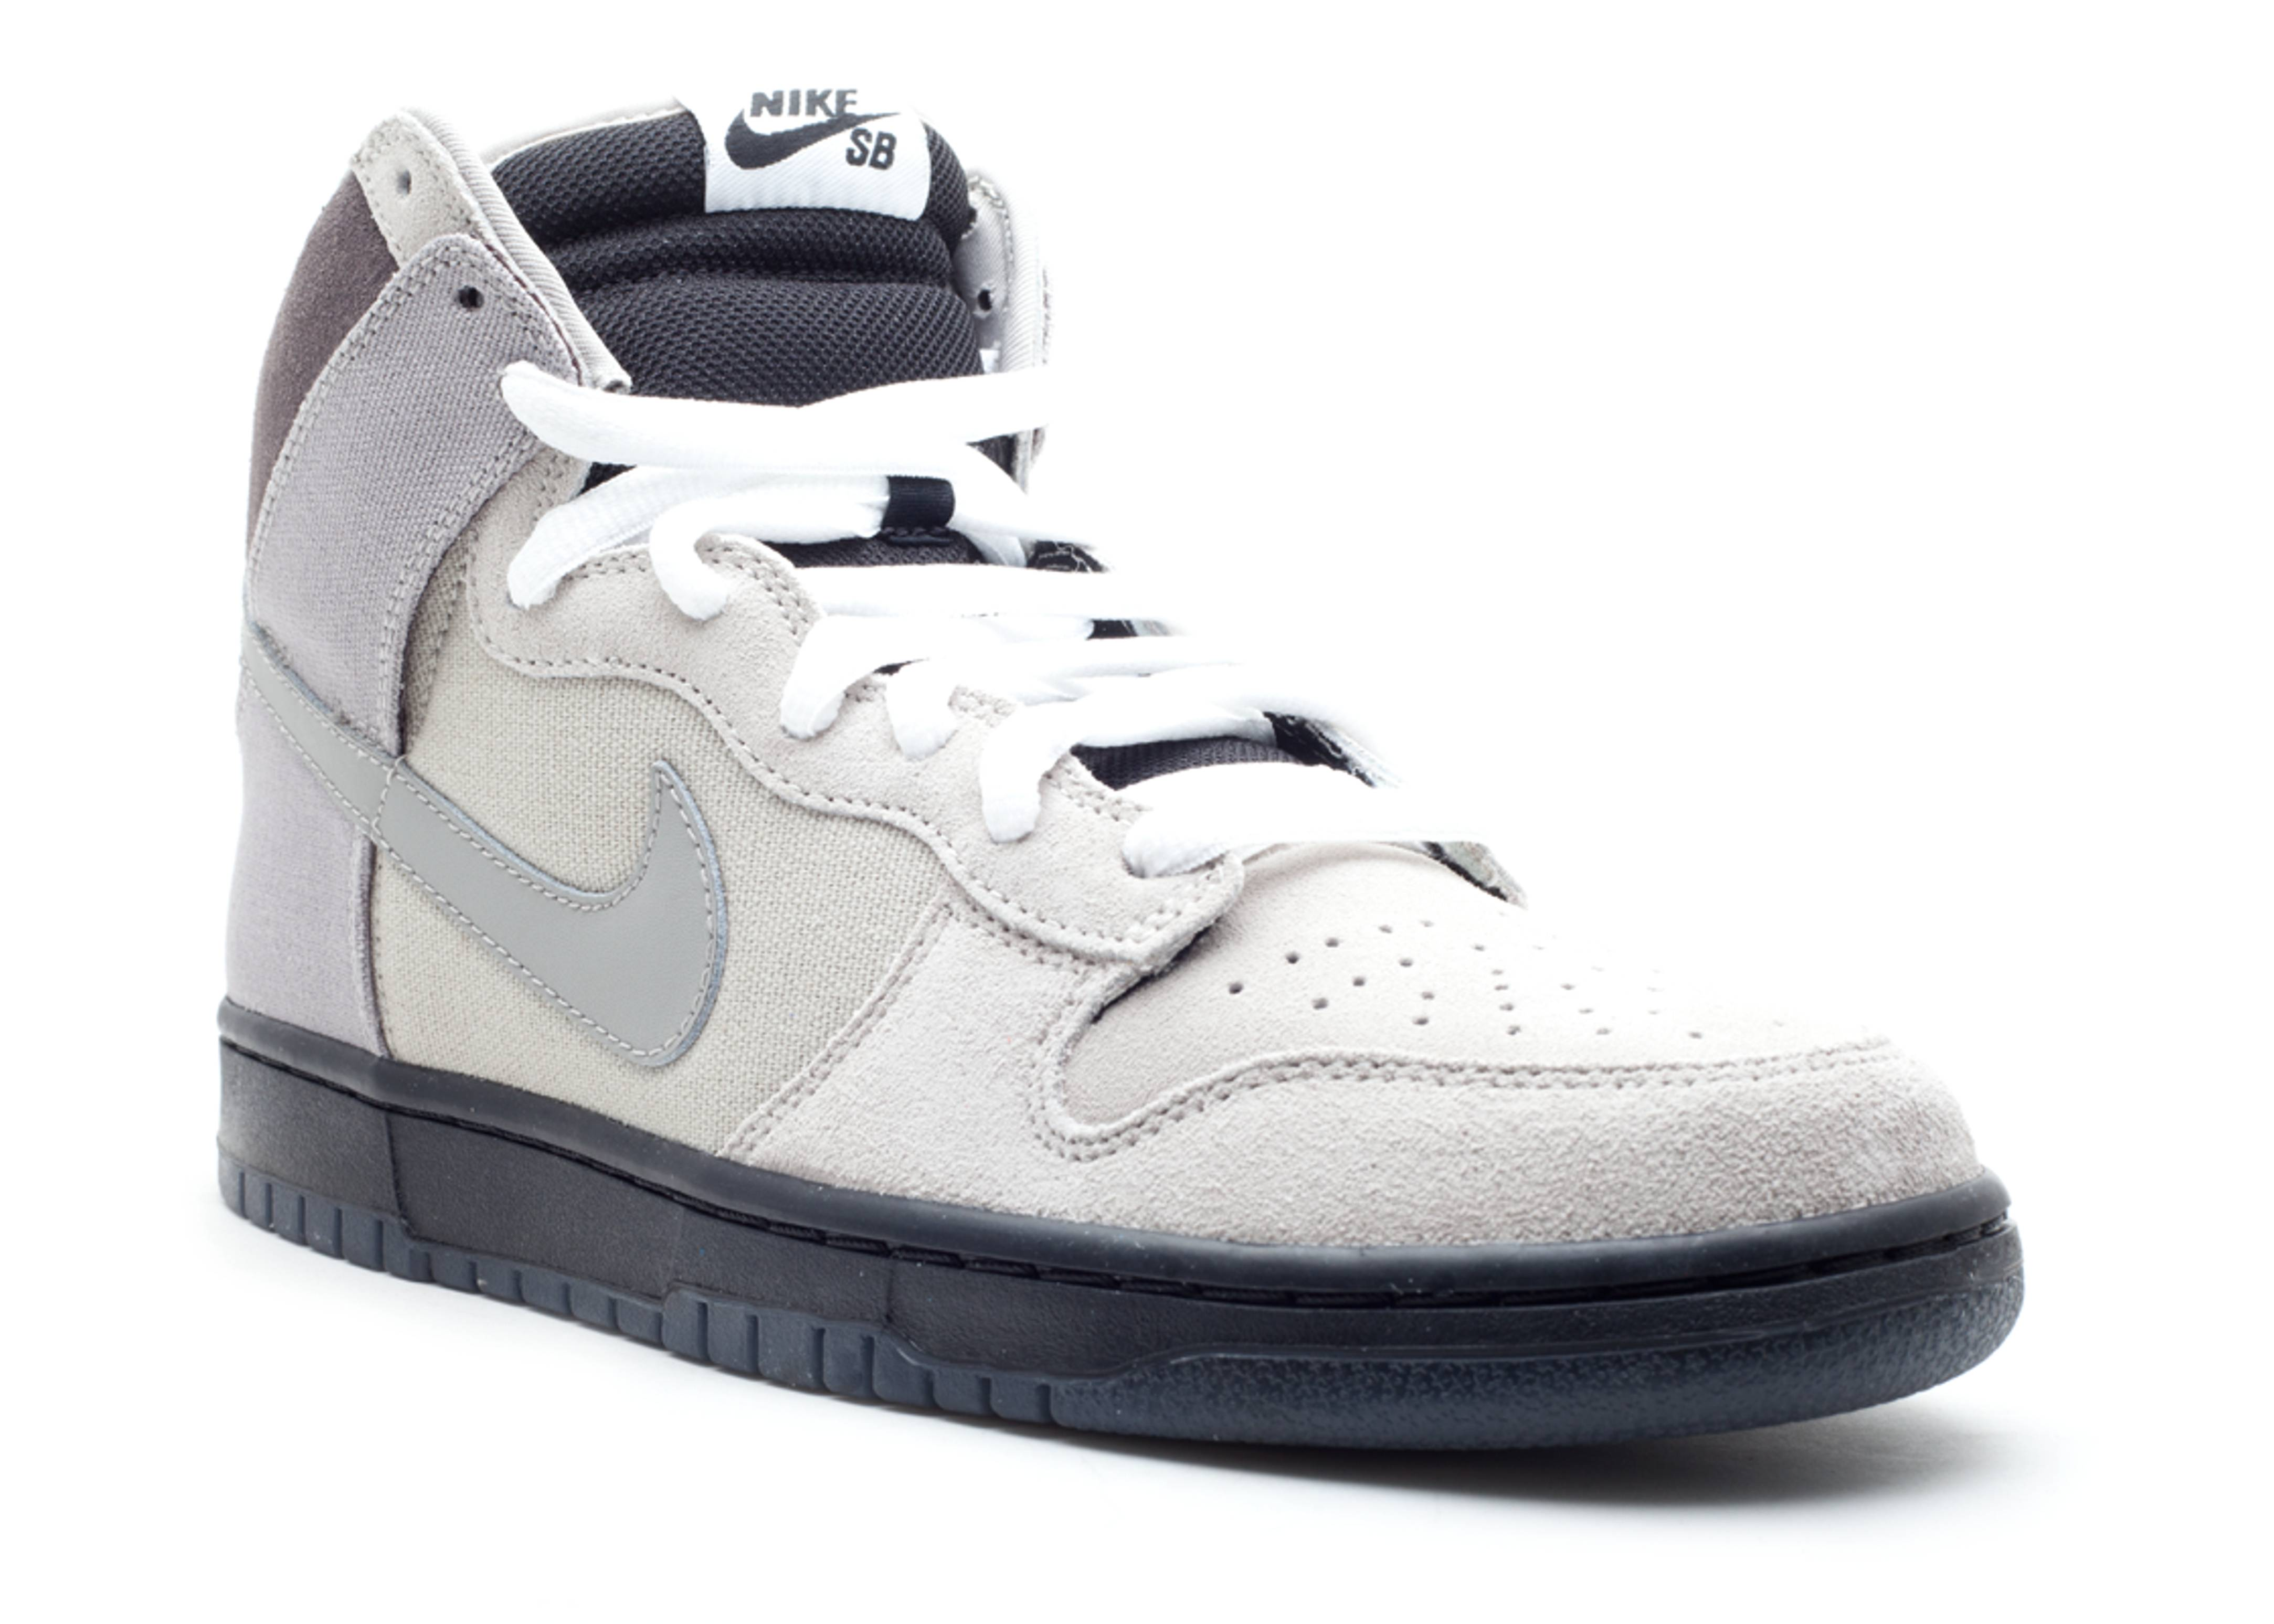 24f926e0e39e ... Dunk High Pro Sb - Nike - 305050 006 - magnet medium grey Flight Club  clearance